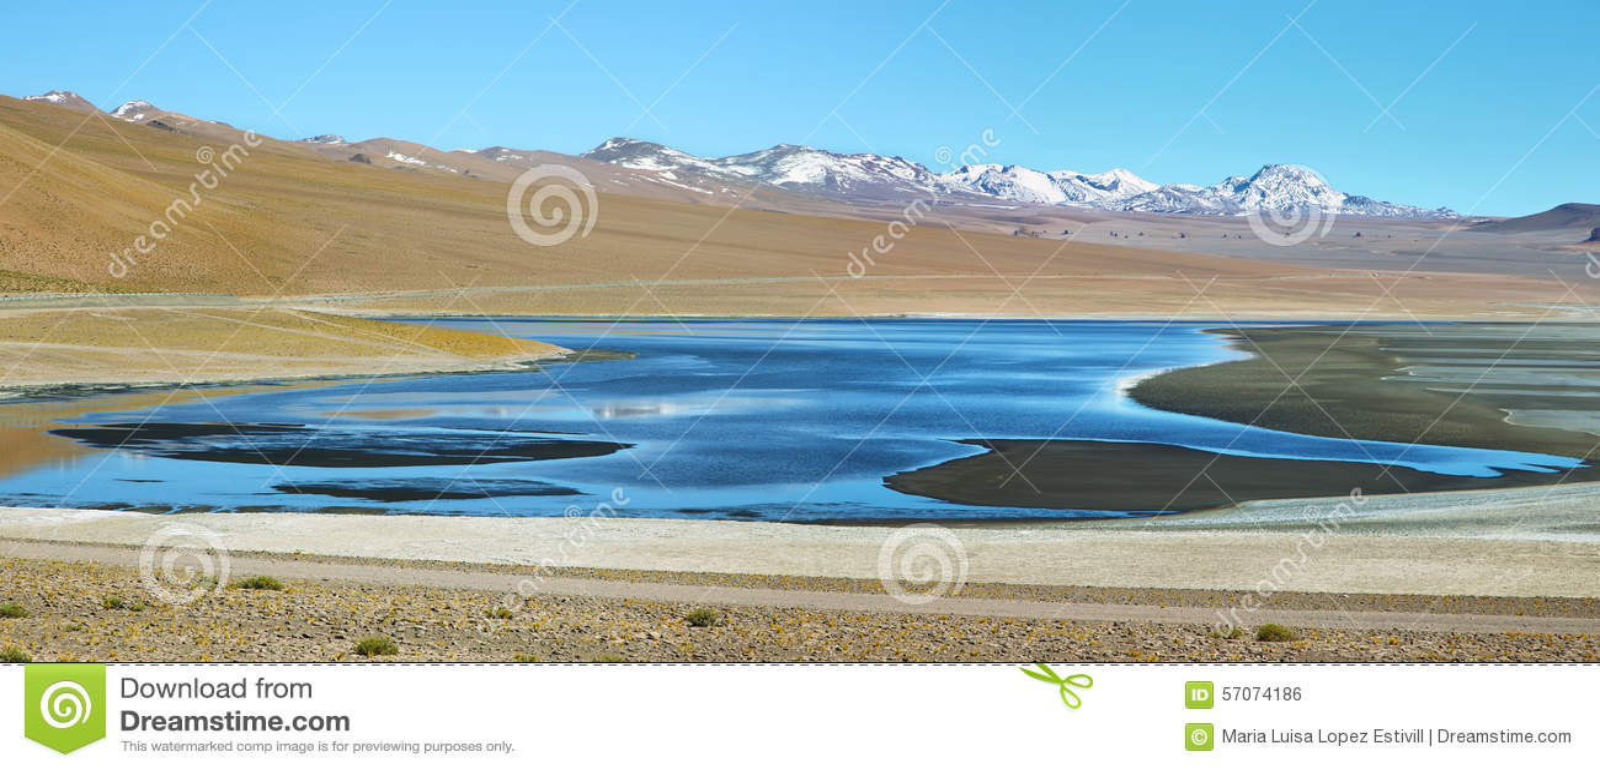 Mening van de lagune van Aguas calientes